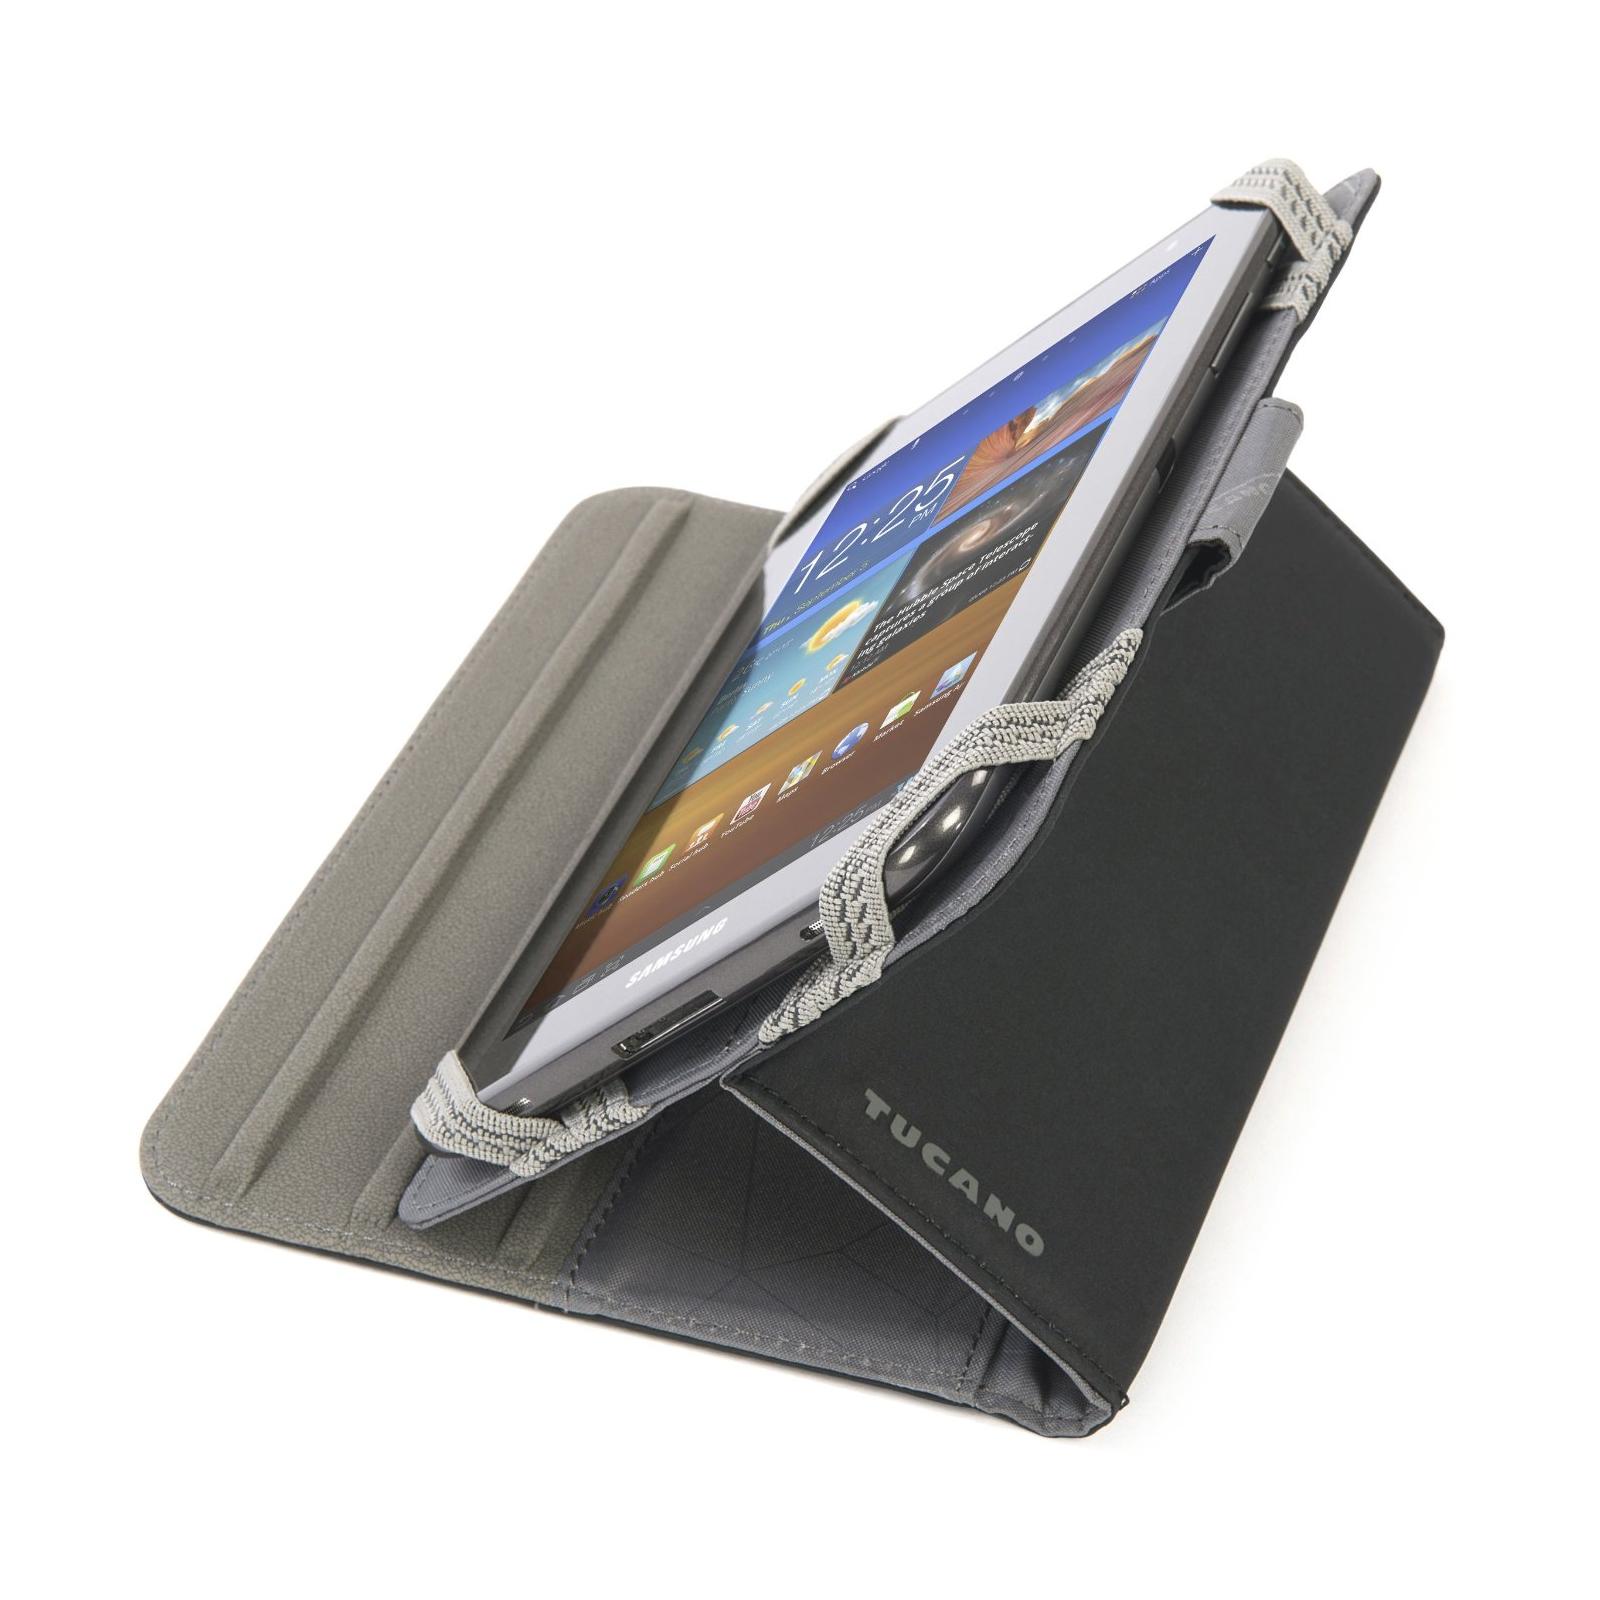 "Чехол для планшета Tucano 7"" Facile Stand Black (TAB-FA7) изображение 5"